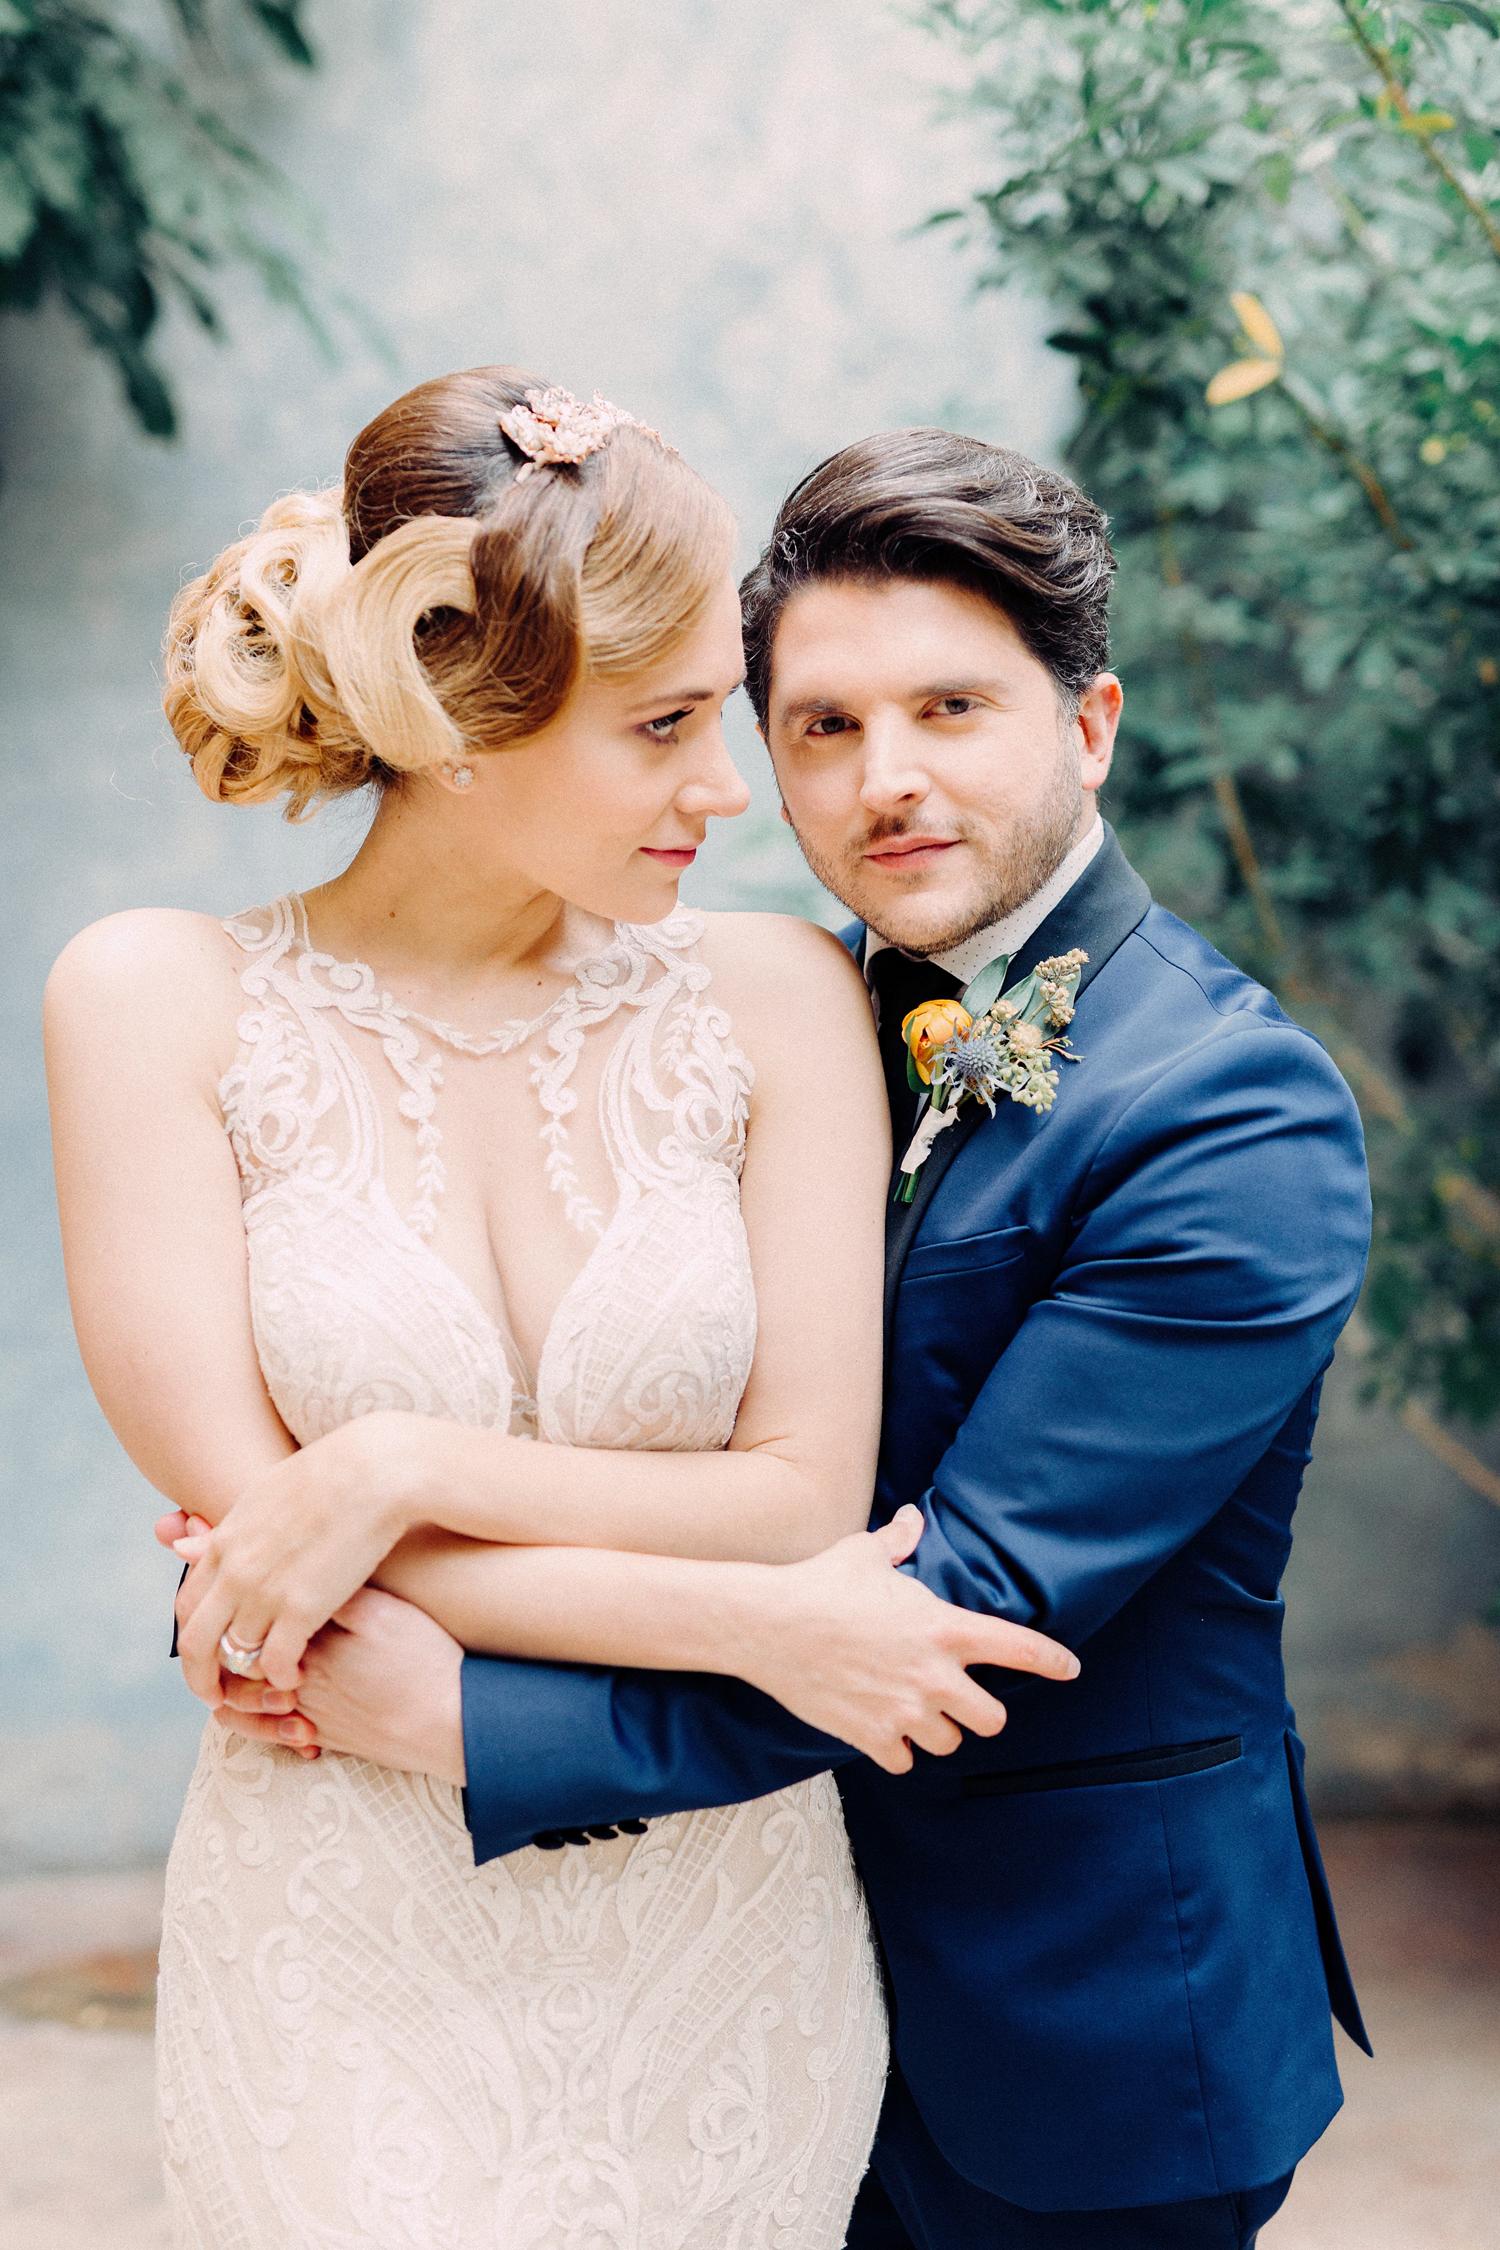 039-alaamarzouk-alaamarzoukphotography-mcallenweddingphotographer-alaa-marzouk-mcallen-mission-wedding-texas-venue-photography-wedding-california-bride-bridal-engagement-austin-elopement.jpg